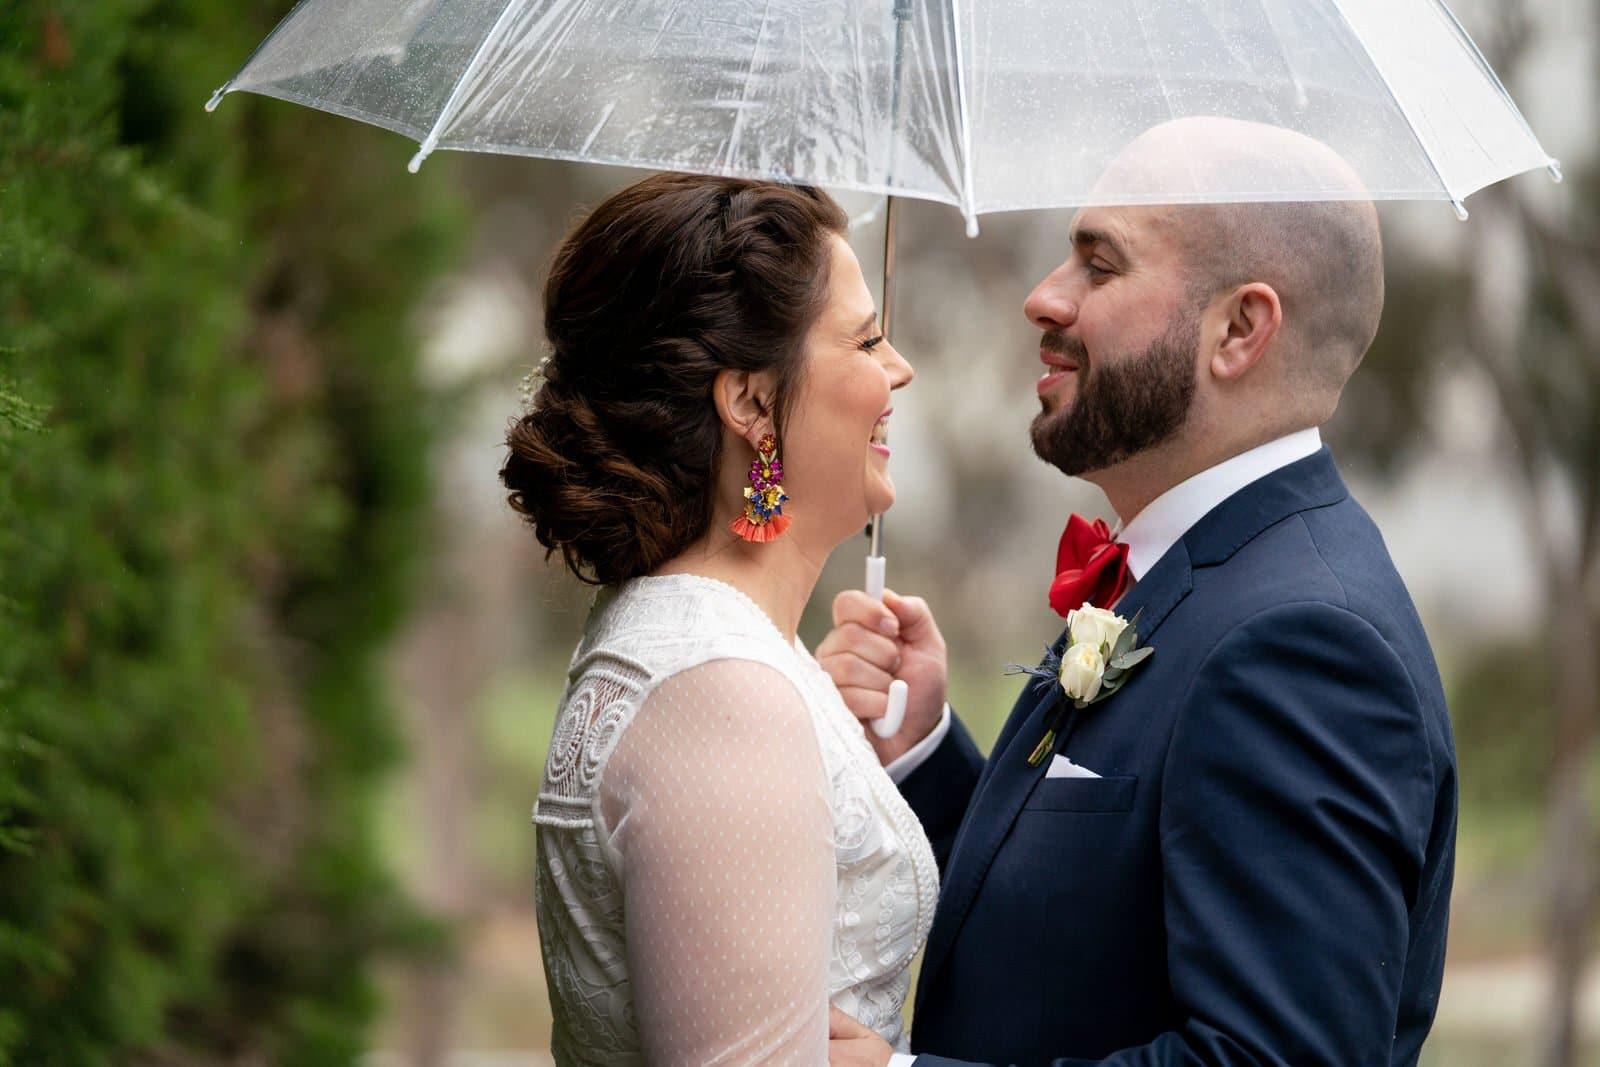 Raining wedding photography